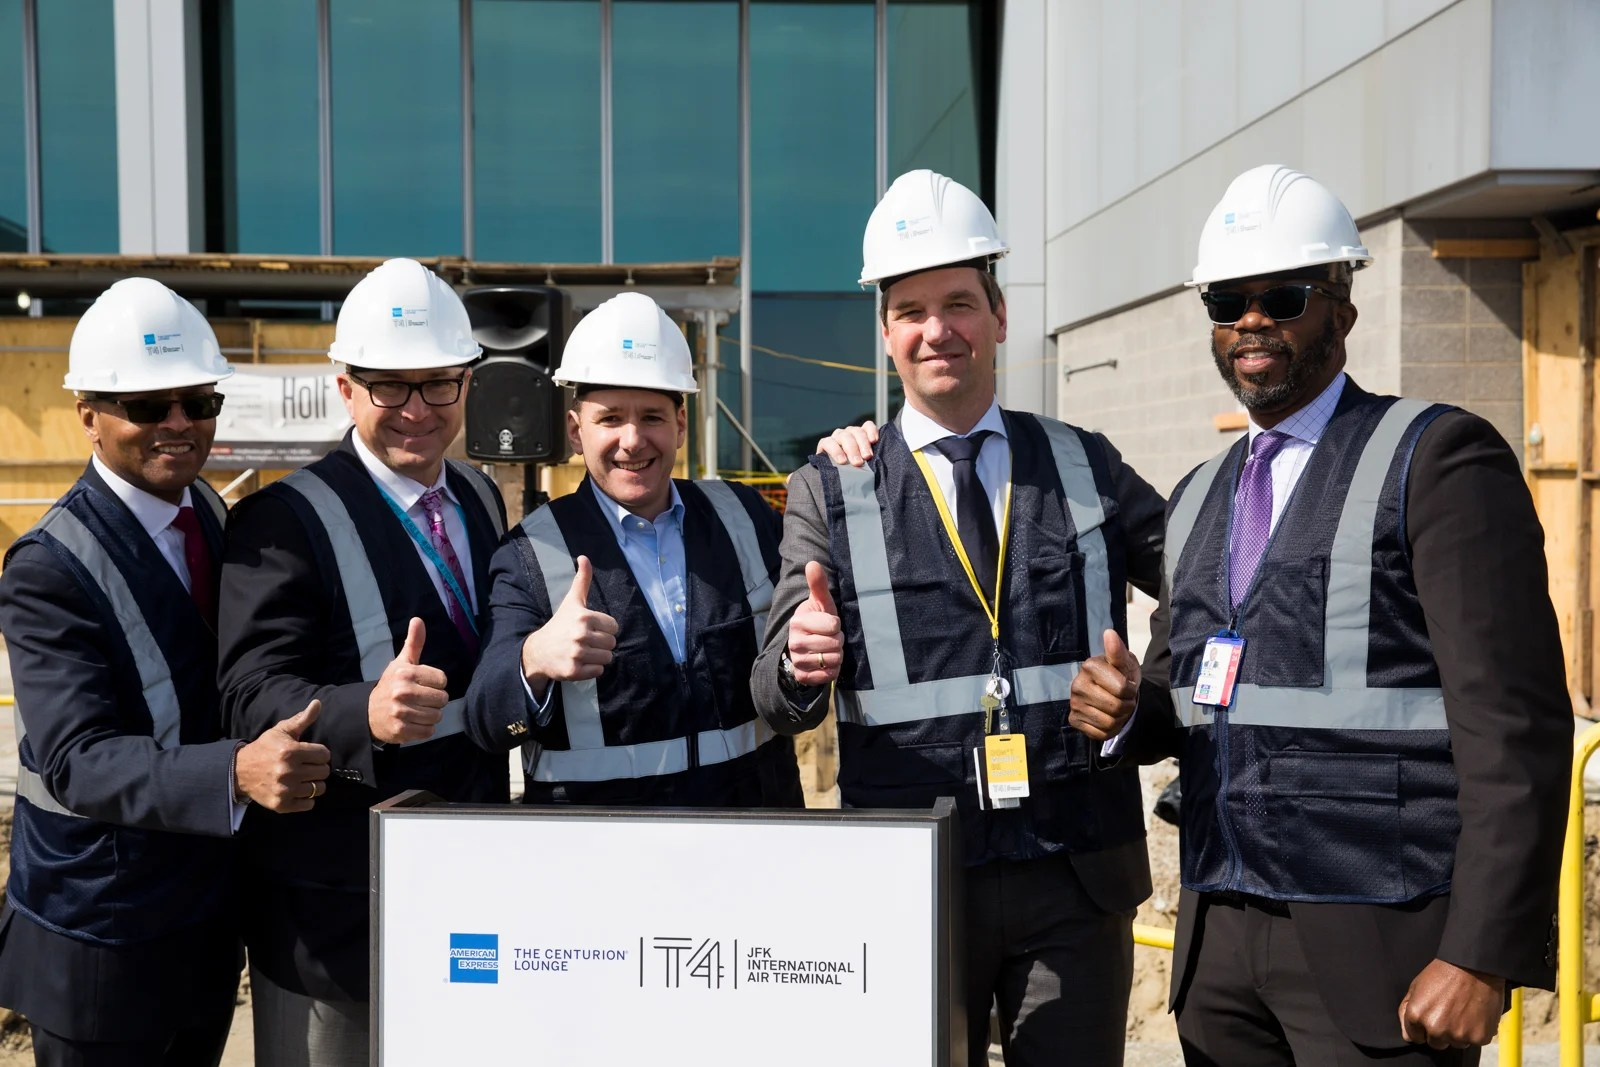 Amex Starts Building New York JFK's Centurion Lounge